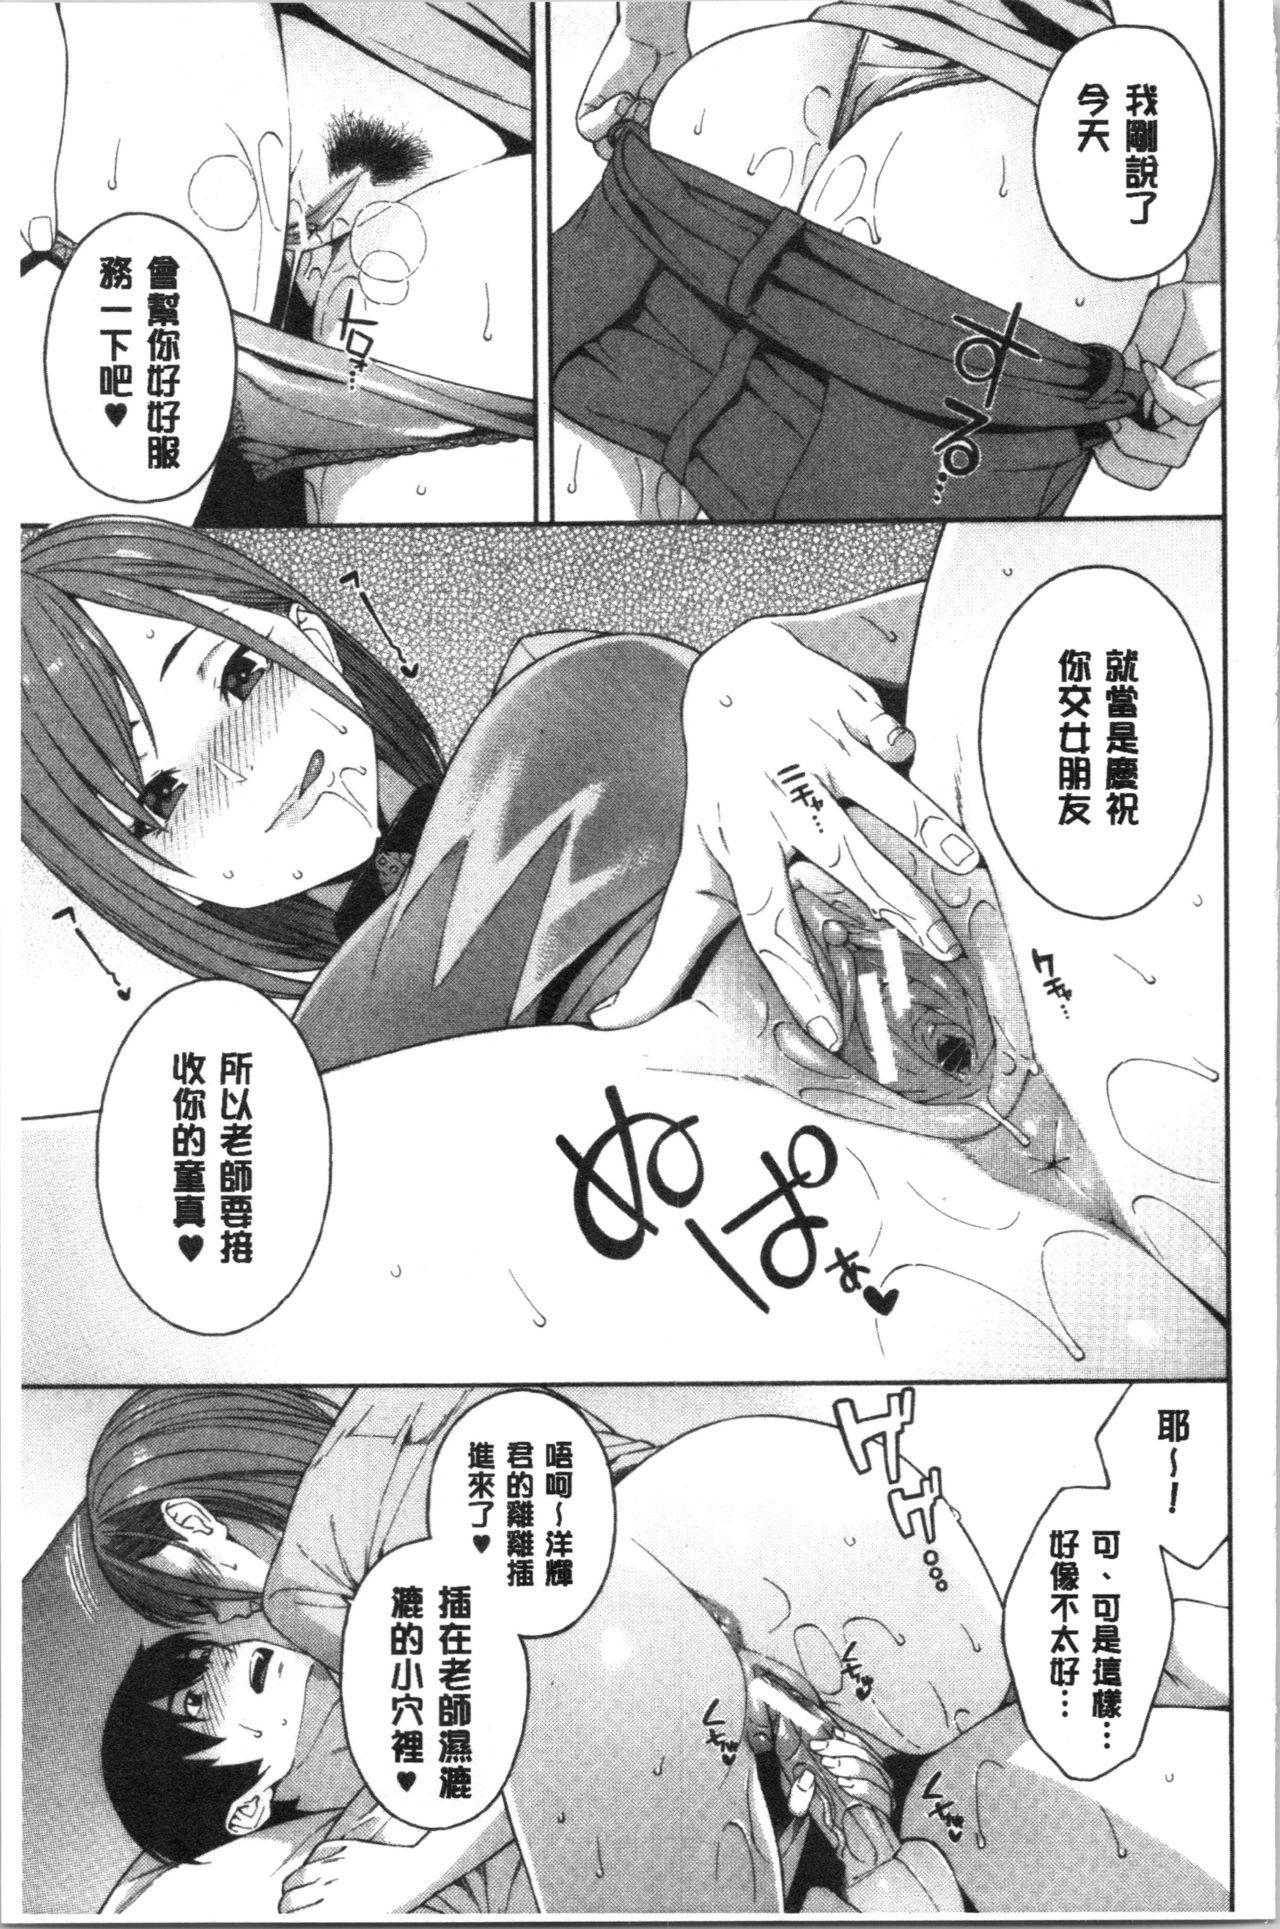 Okashite Ageru | 讓你來侵犯我 187